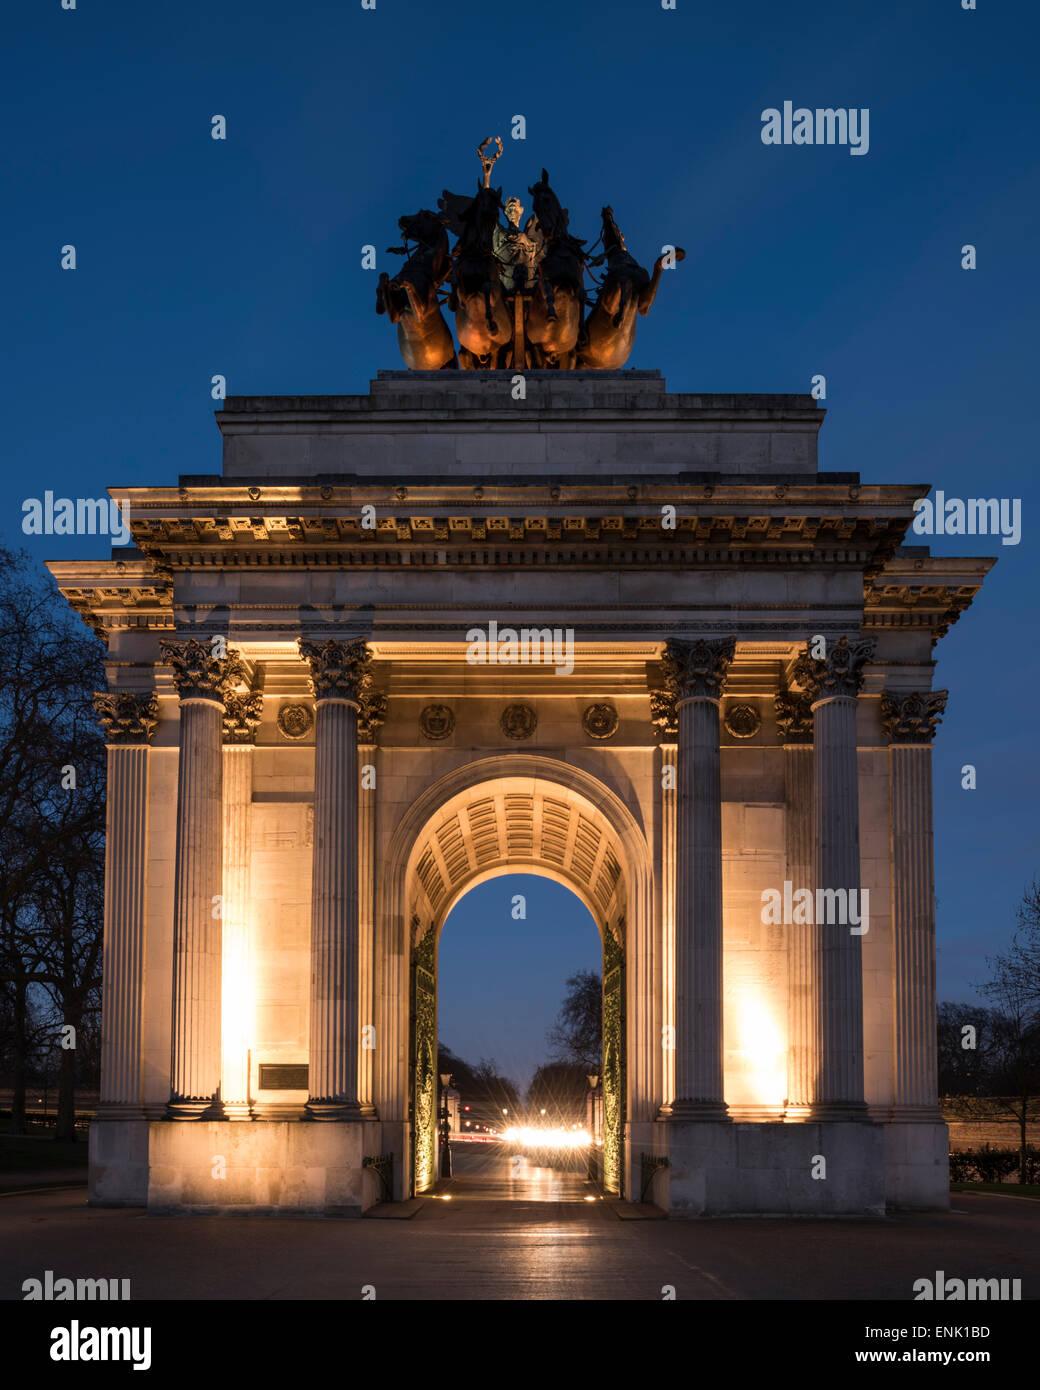 Exterior of Wellington Arch at night, Hyde Park Corner, London, England, United Kingdom, Europe - Stock Image